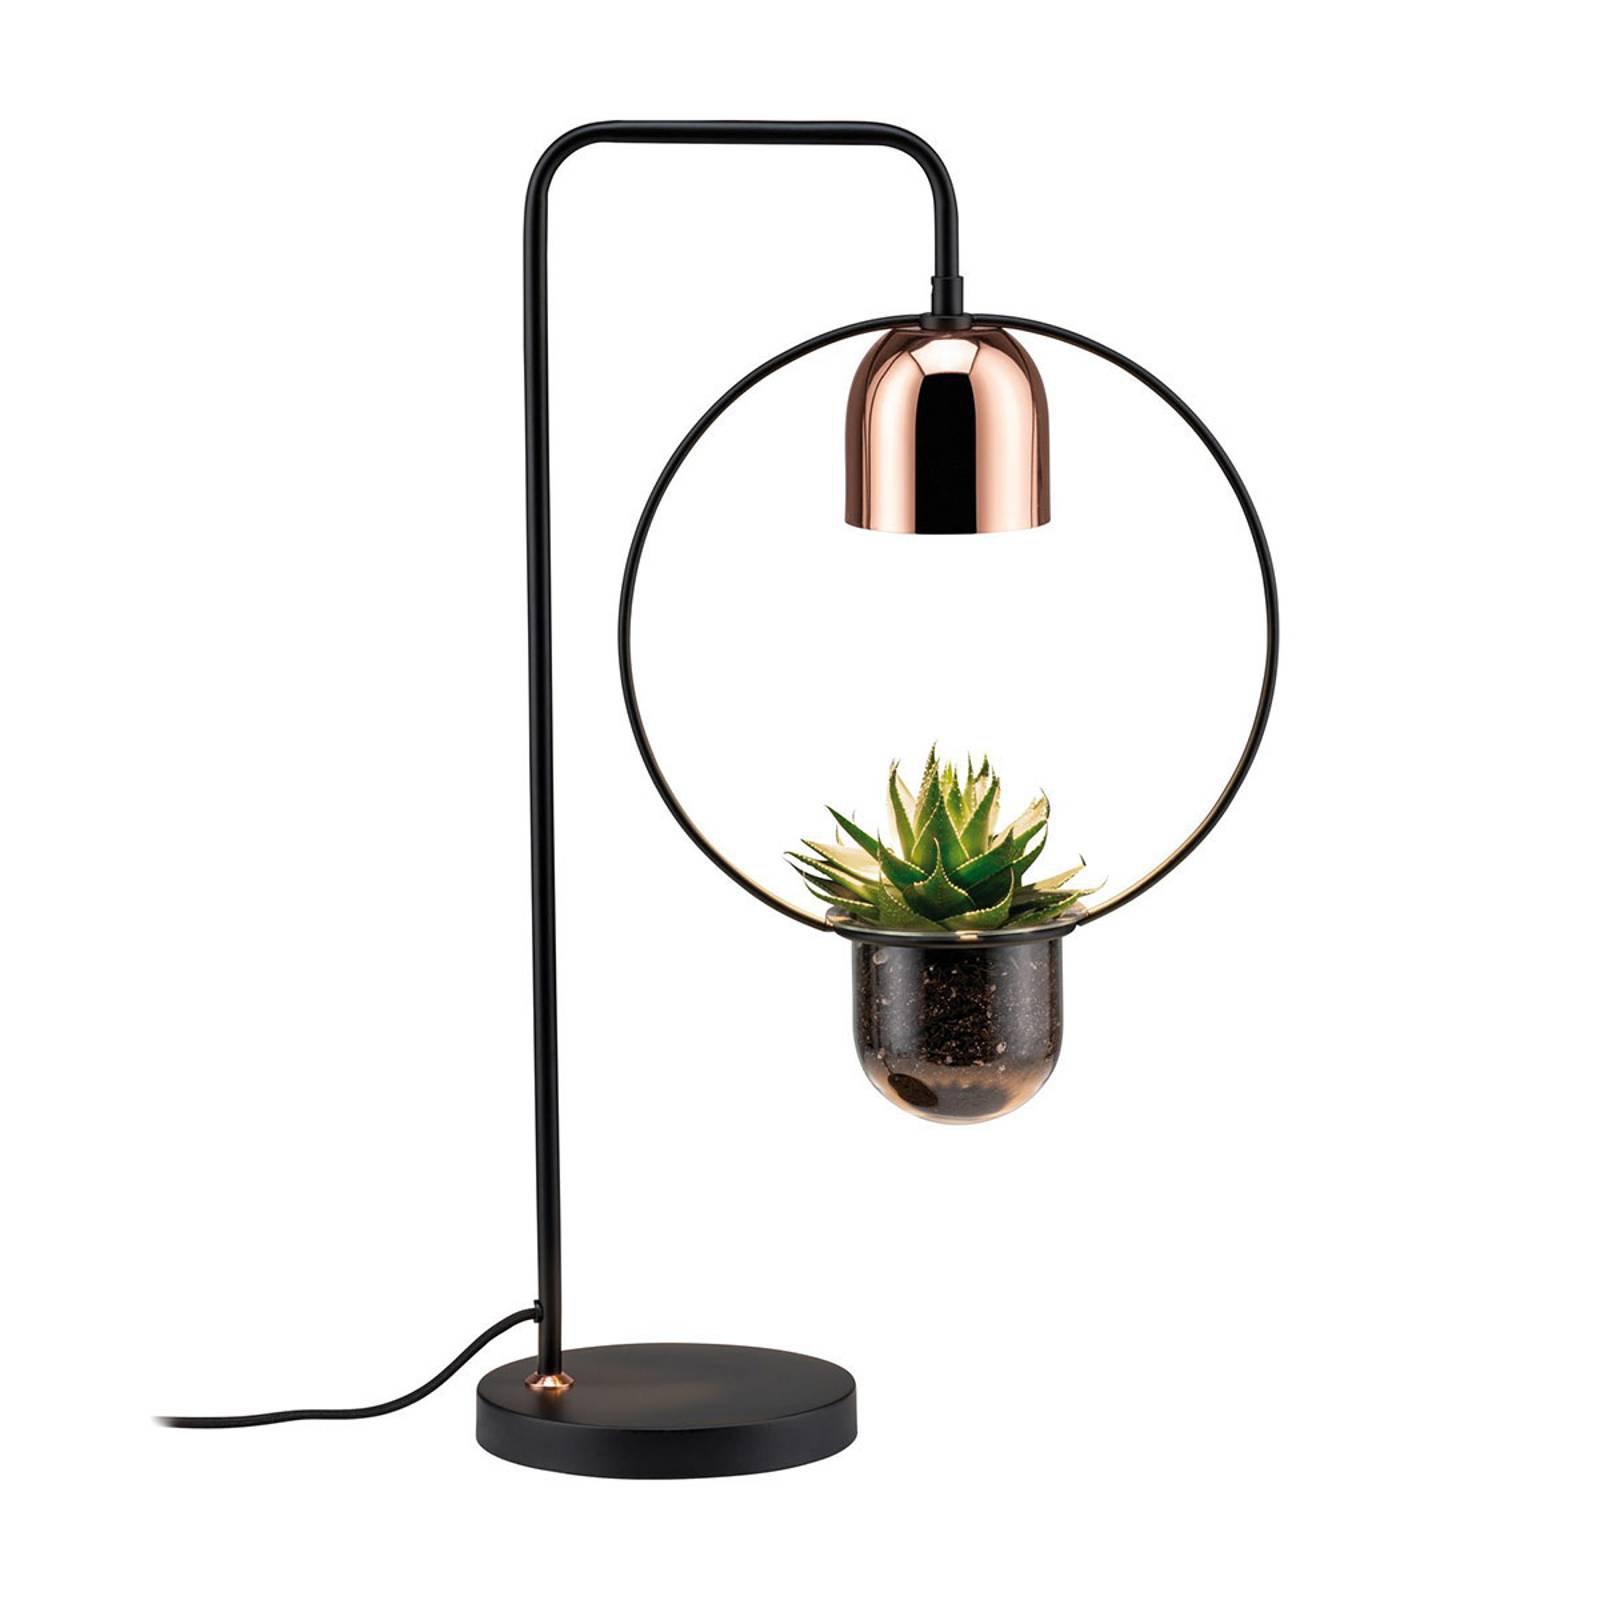 Paulmann bordlampe Fanja med plantepotte